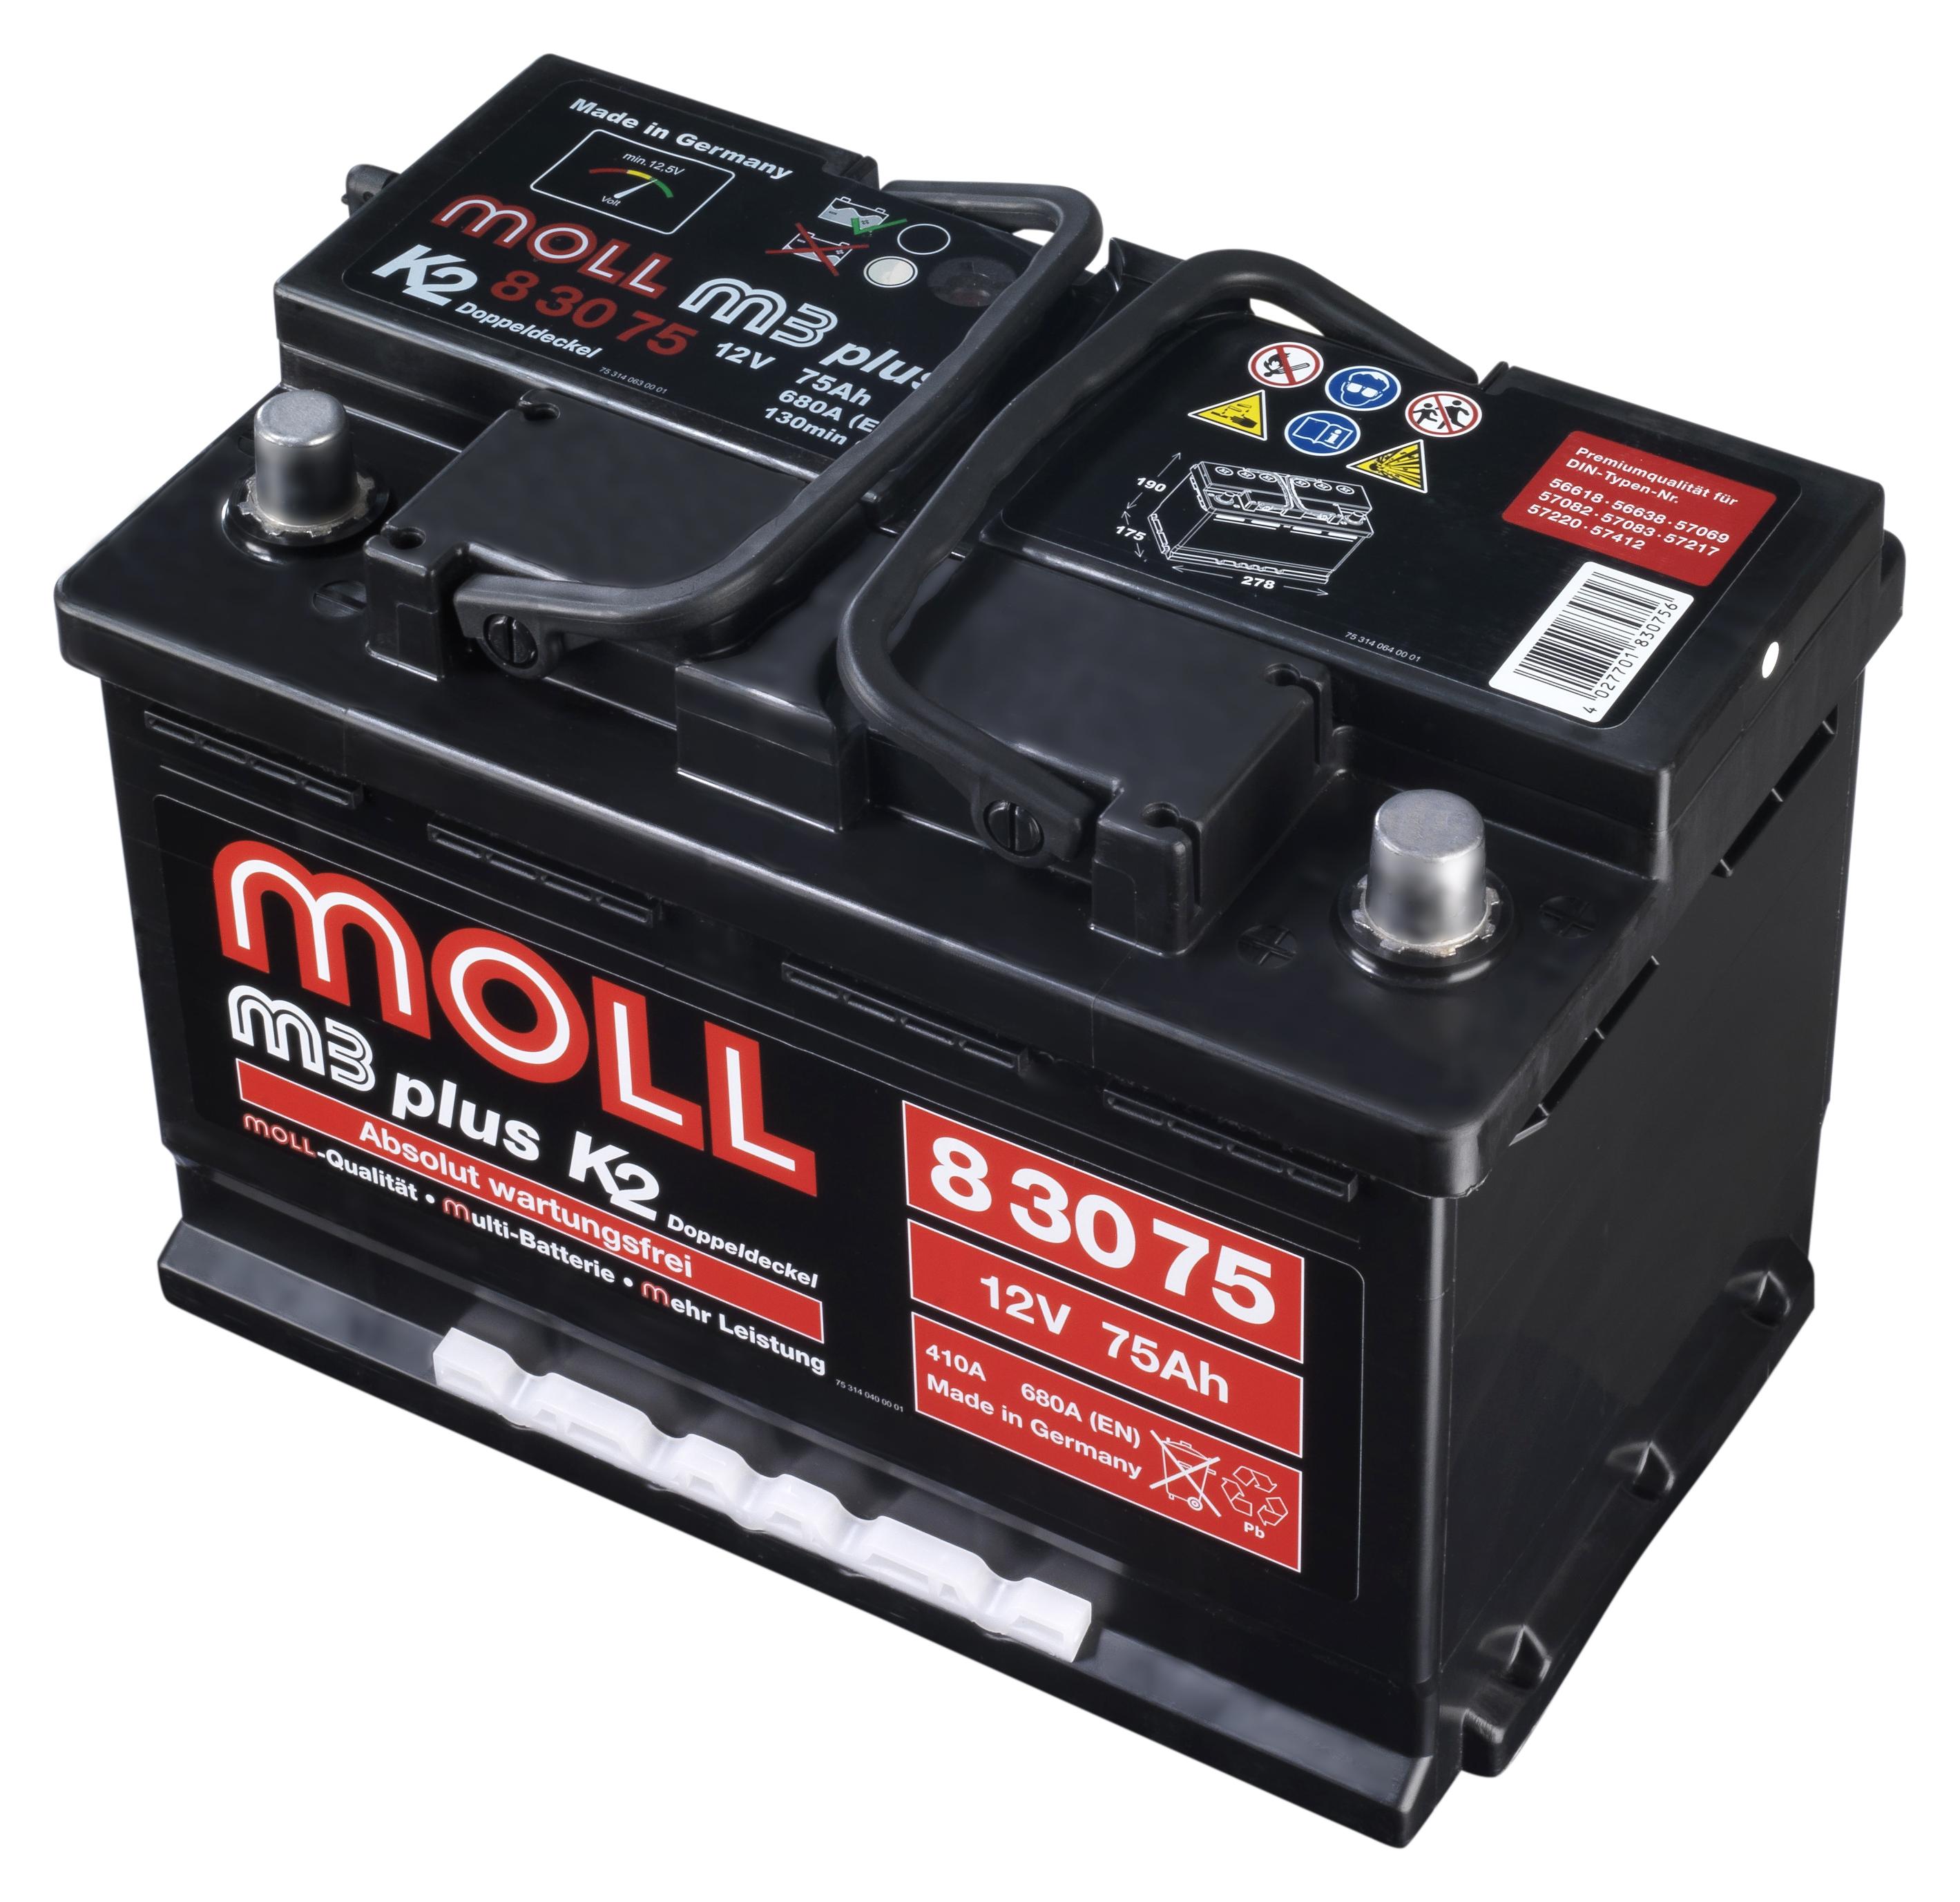 MOLL M3 plus K2 83075